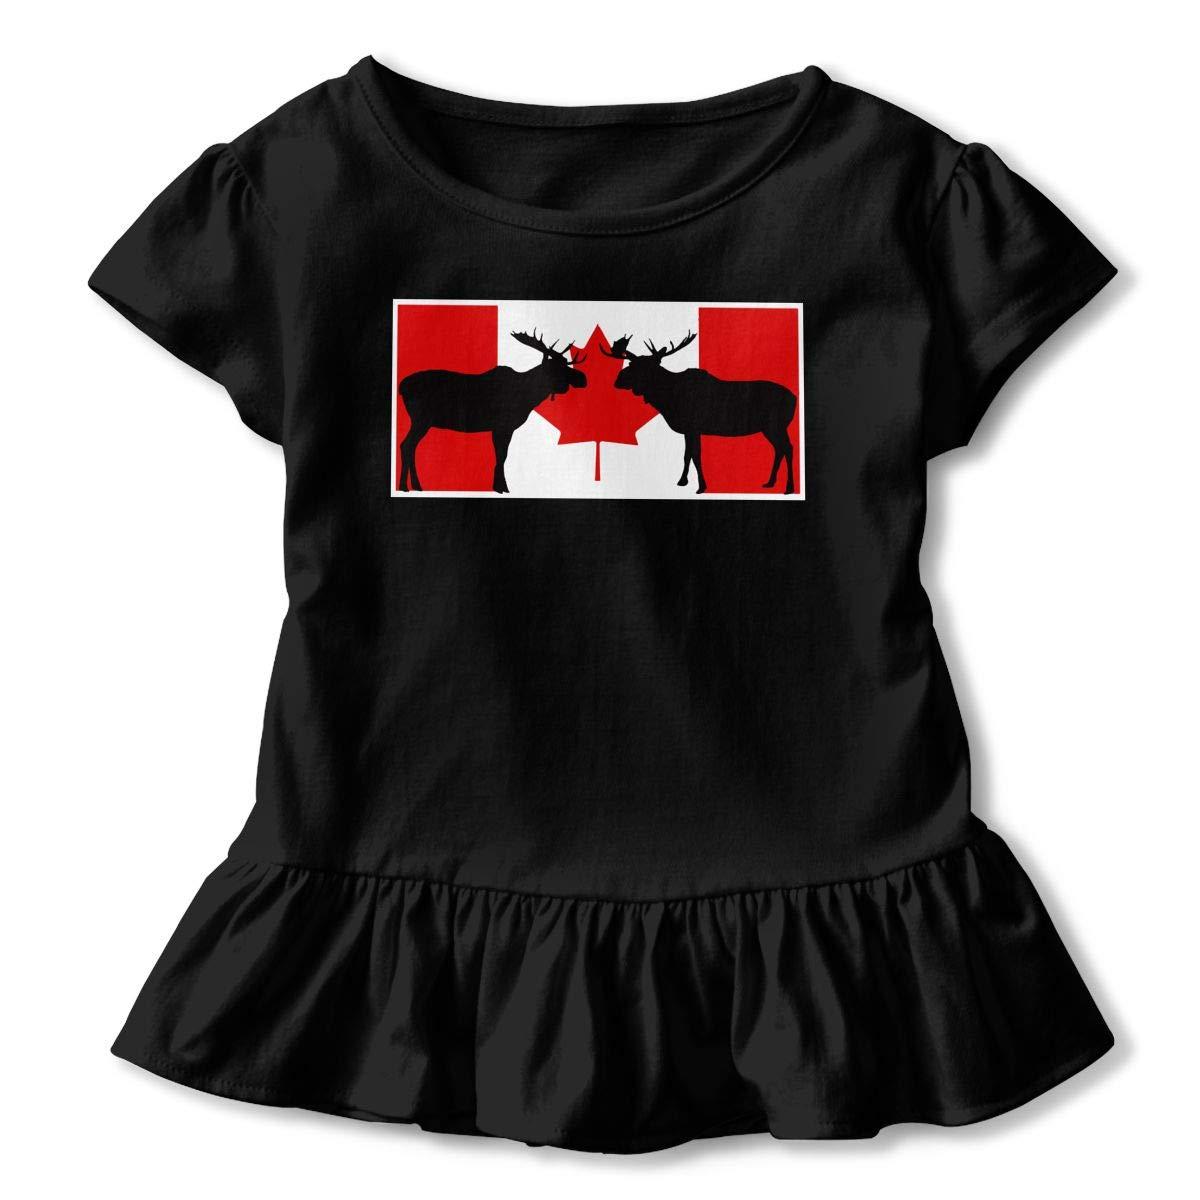 Short-Sleeve Moose Silhouette On Canadian Flag Shirts for Kids 2-6T Ruffled Tunic Shirt Dress with Falbala